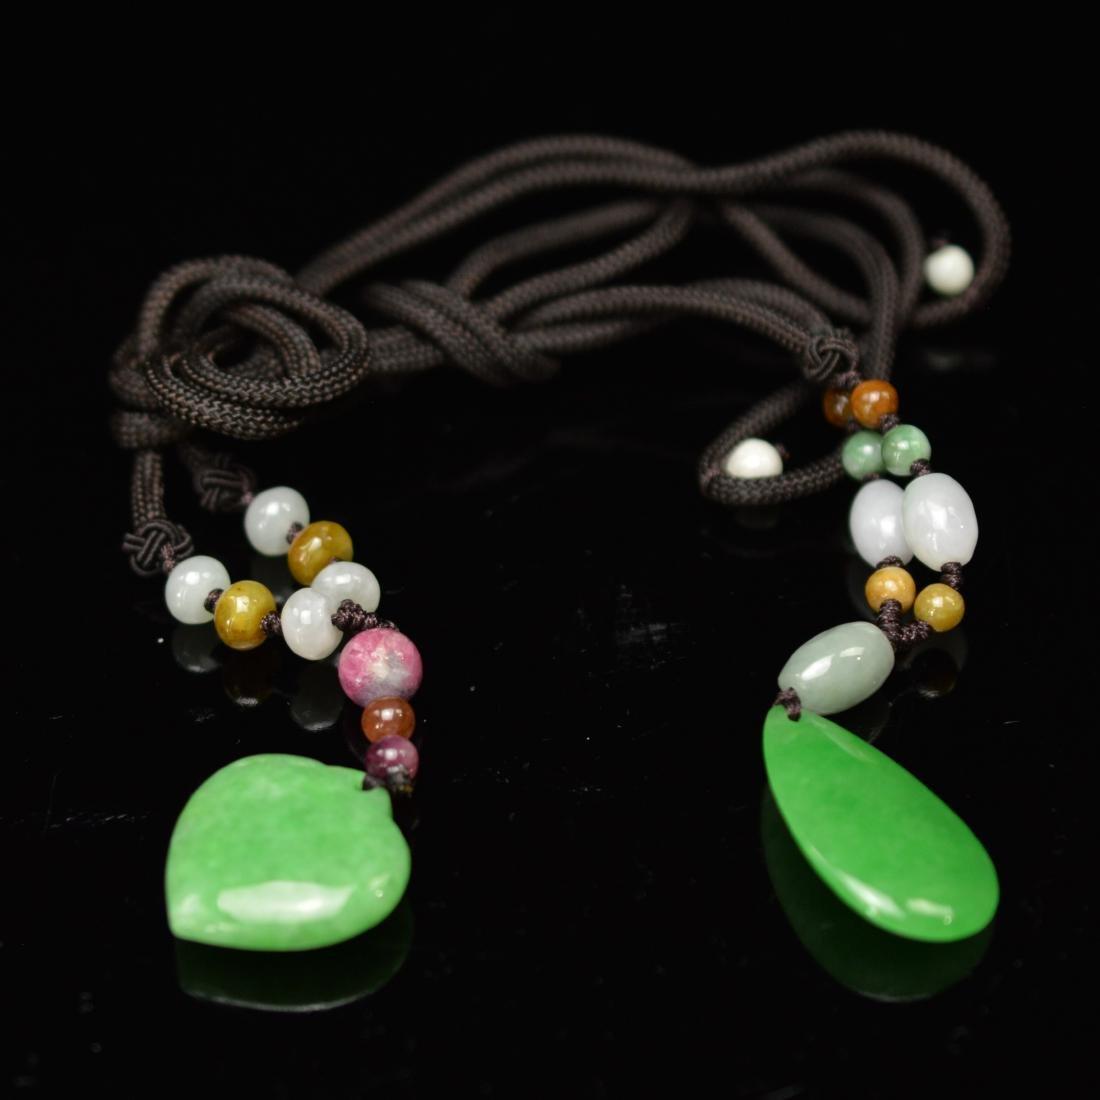 Green jadeite pendant